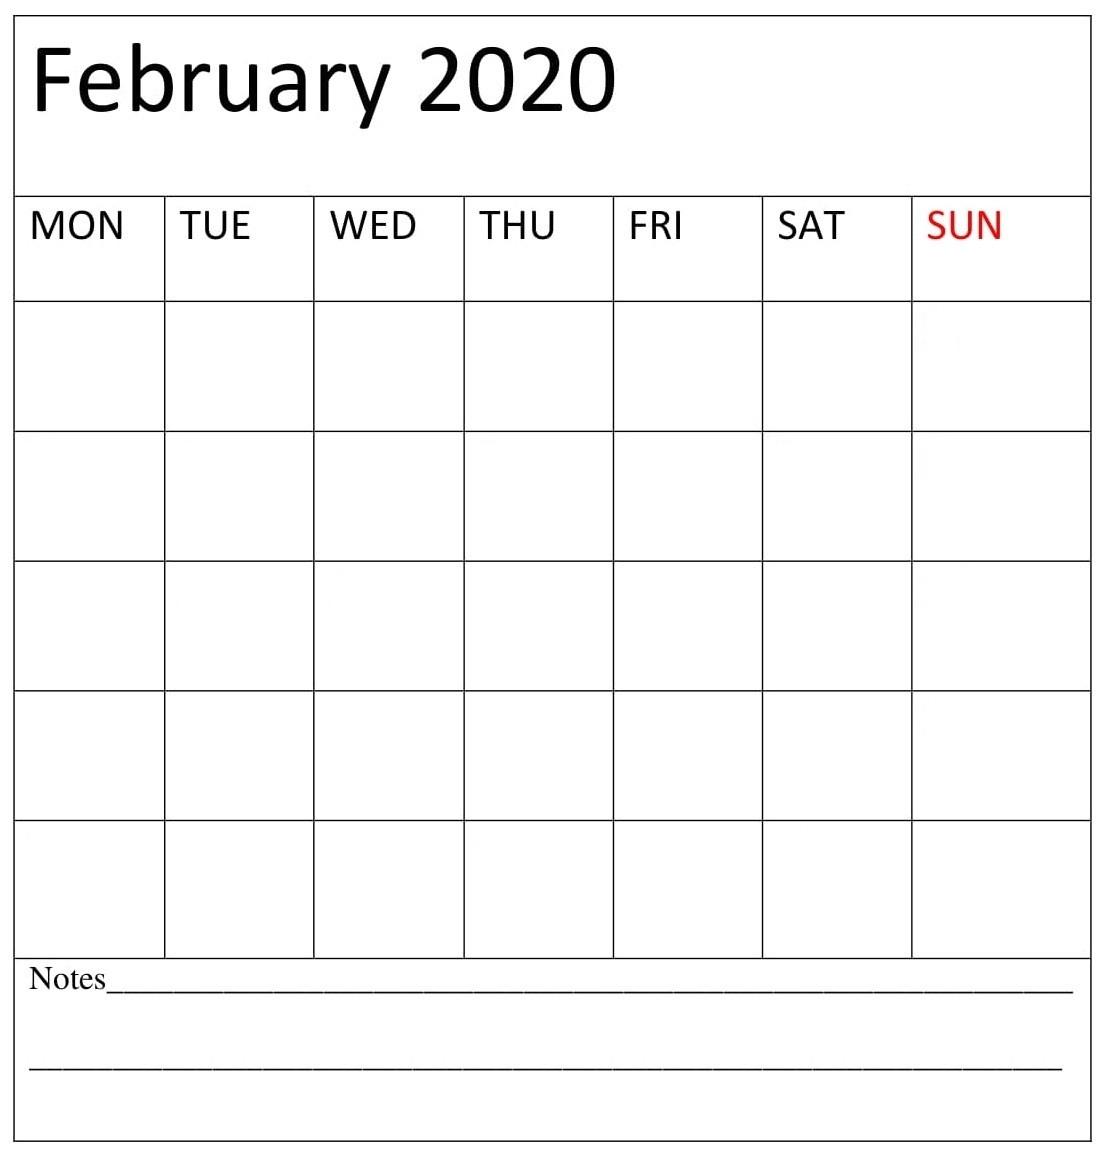 February 2020 Blank Calendar Free Printable - Latest-Printable Blank Calendar Template With Notes